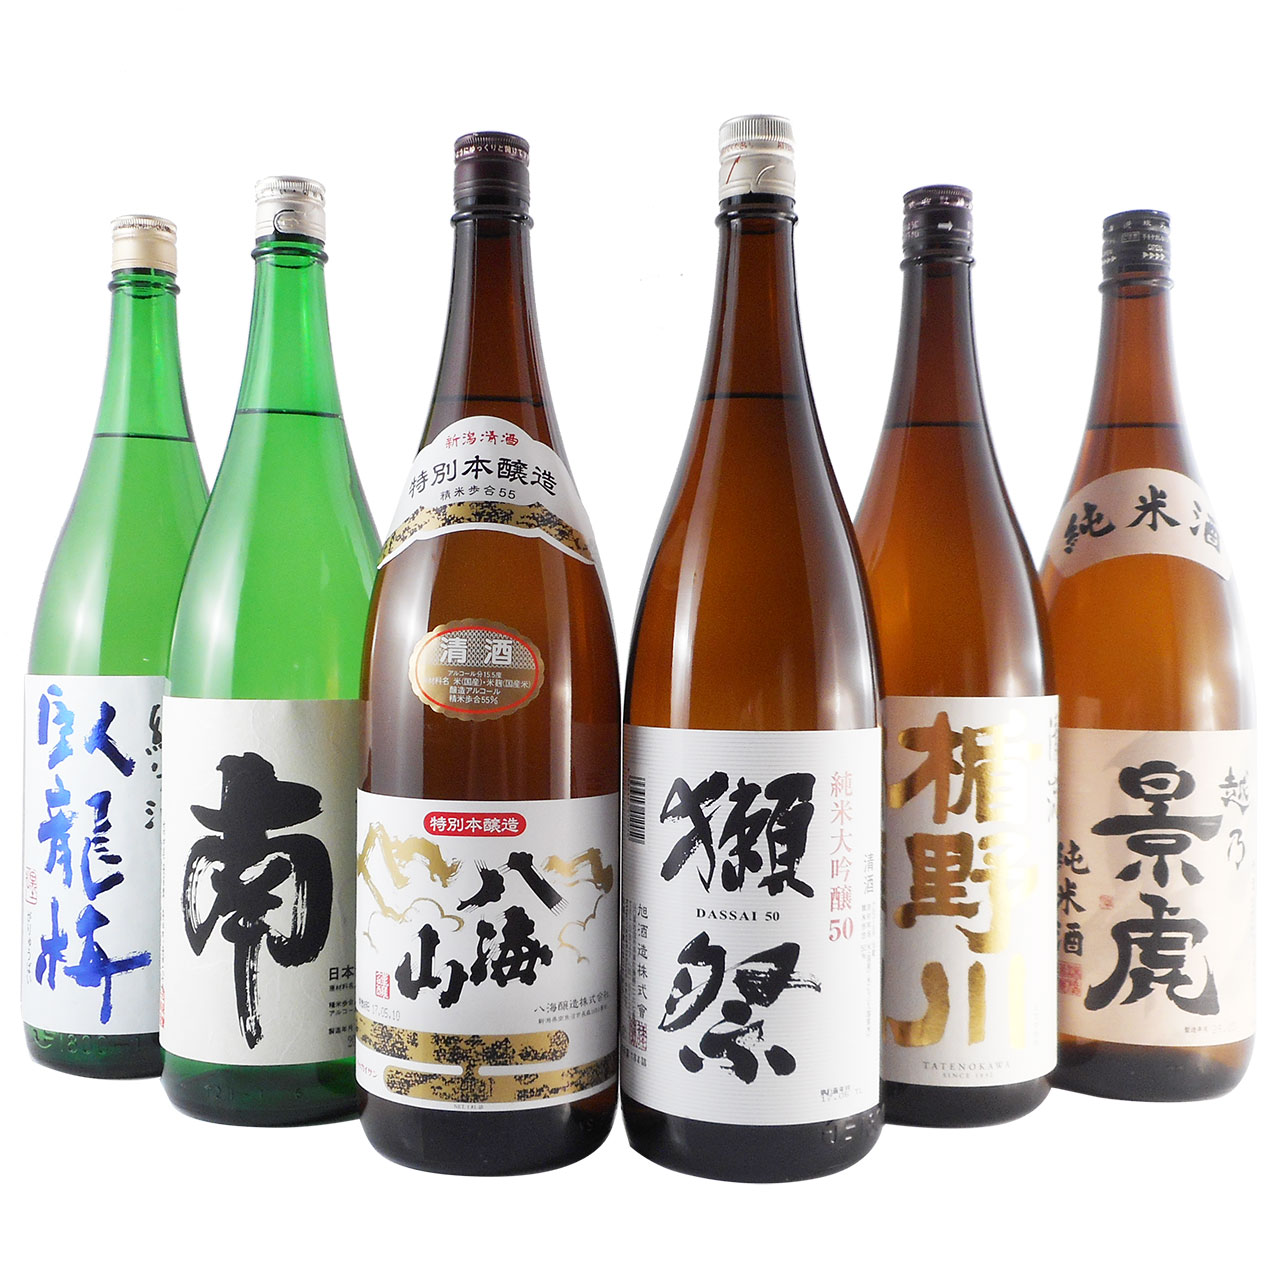 日本酒 飲み比べセット 一升瓶 6本 臥龍梅、南、八海山、獺祭、楯野川、越乃景虎1.8L 送料無料